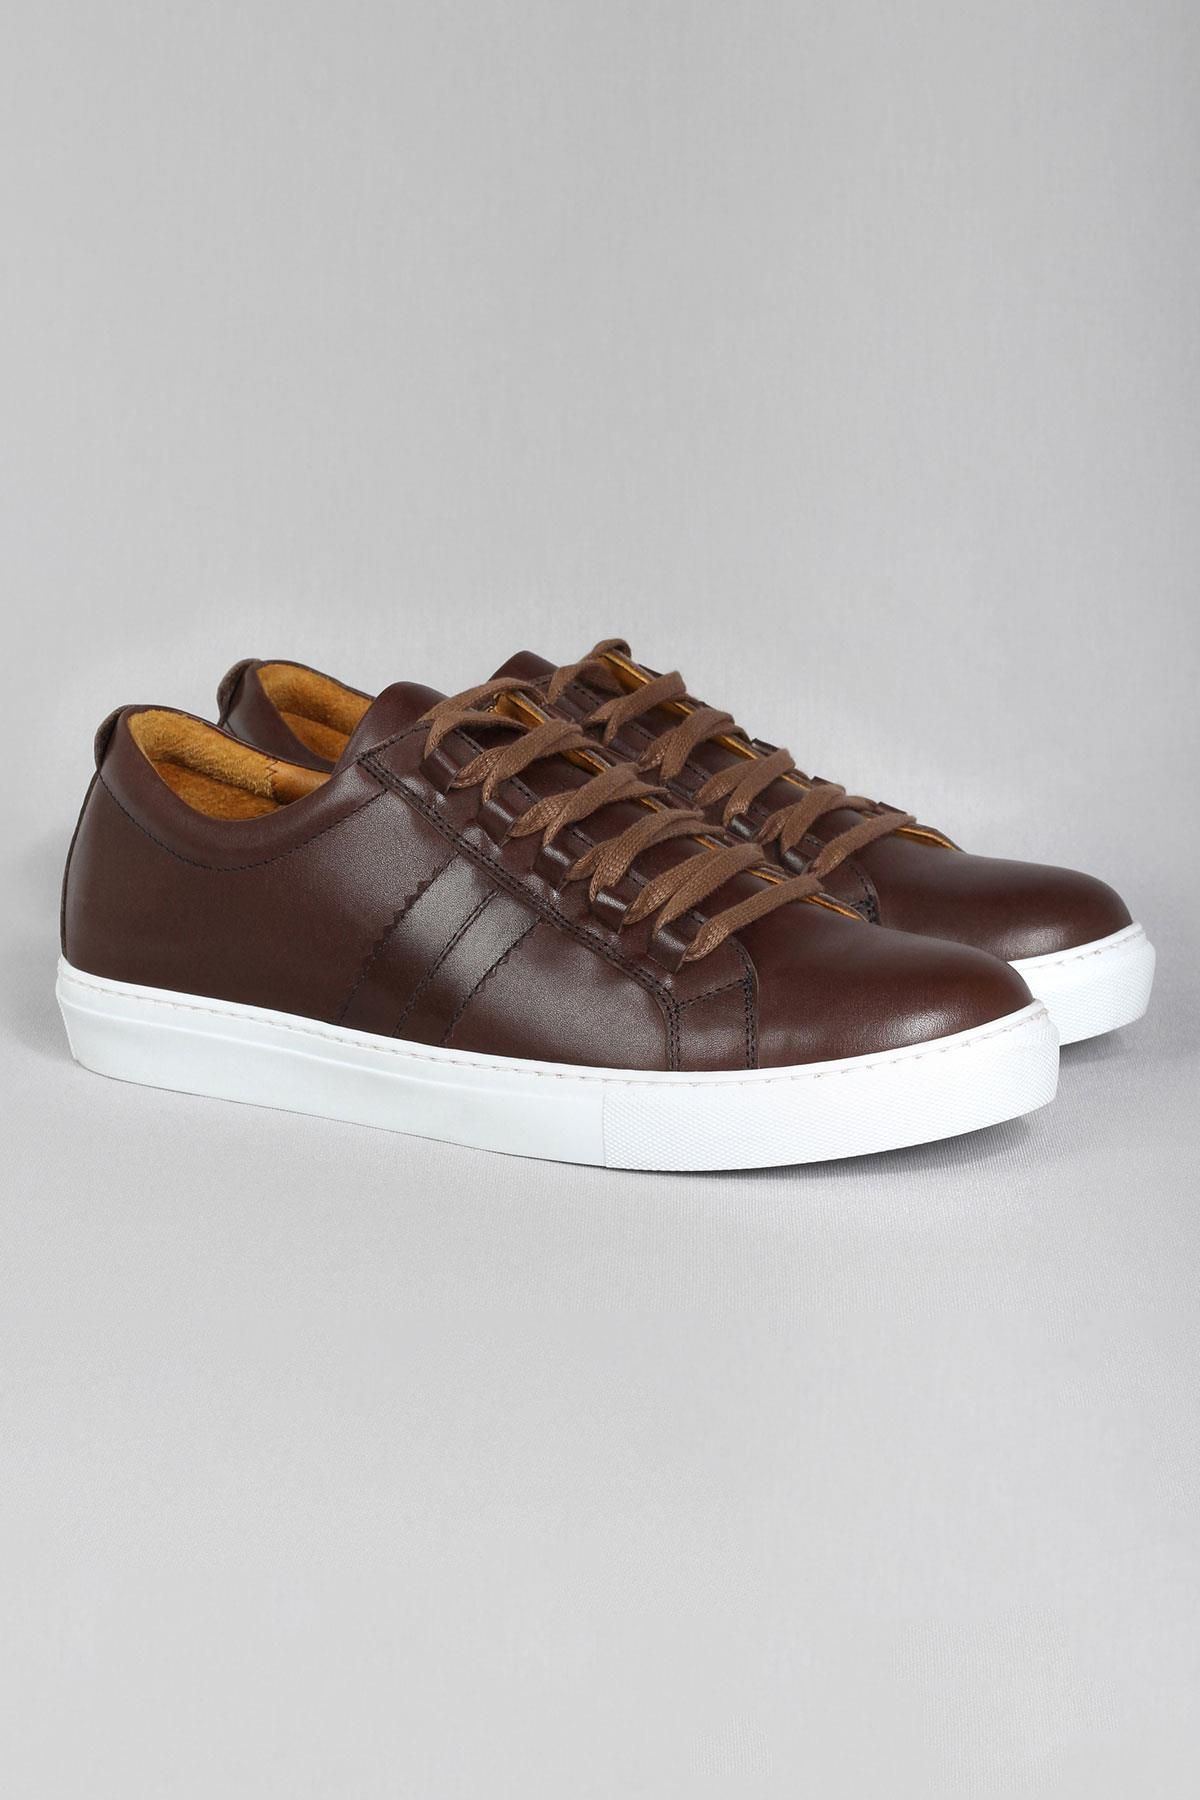 Callizio Mens Sport Shoes Genuine Leather Casual Sneakers Large Size Italian Design European Male Footwear Be Sport Shoes Men Mens Casual Shoes Casual Sneakers